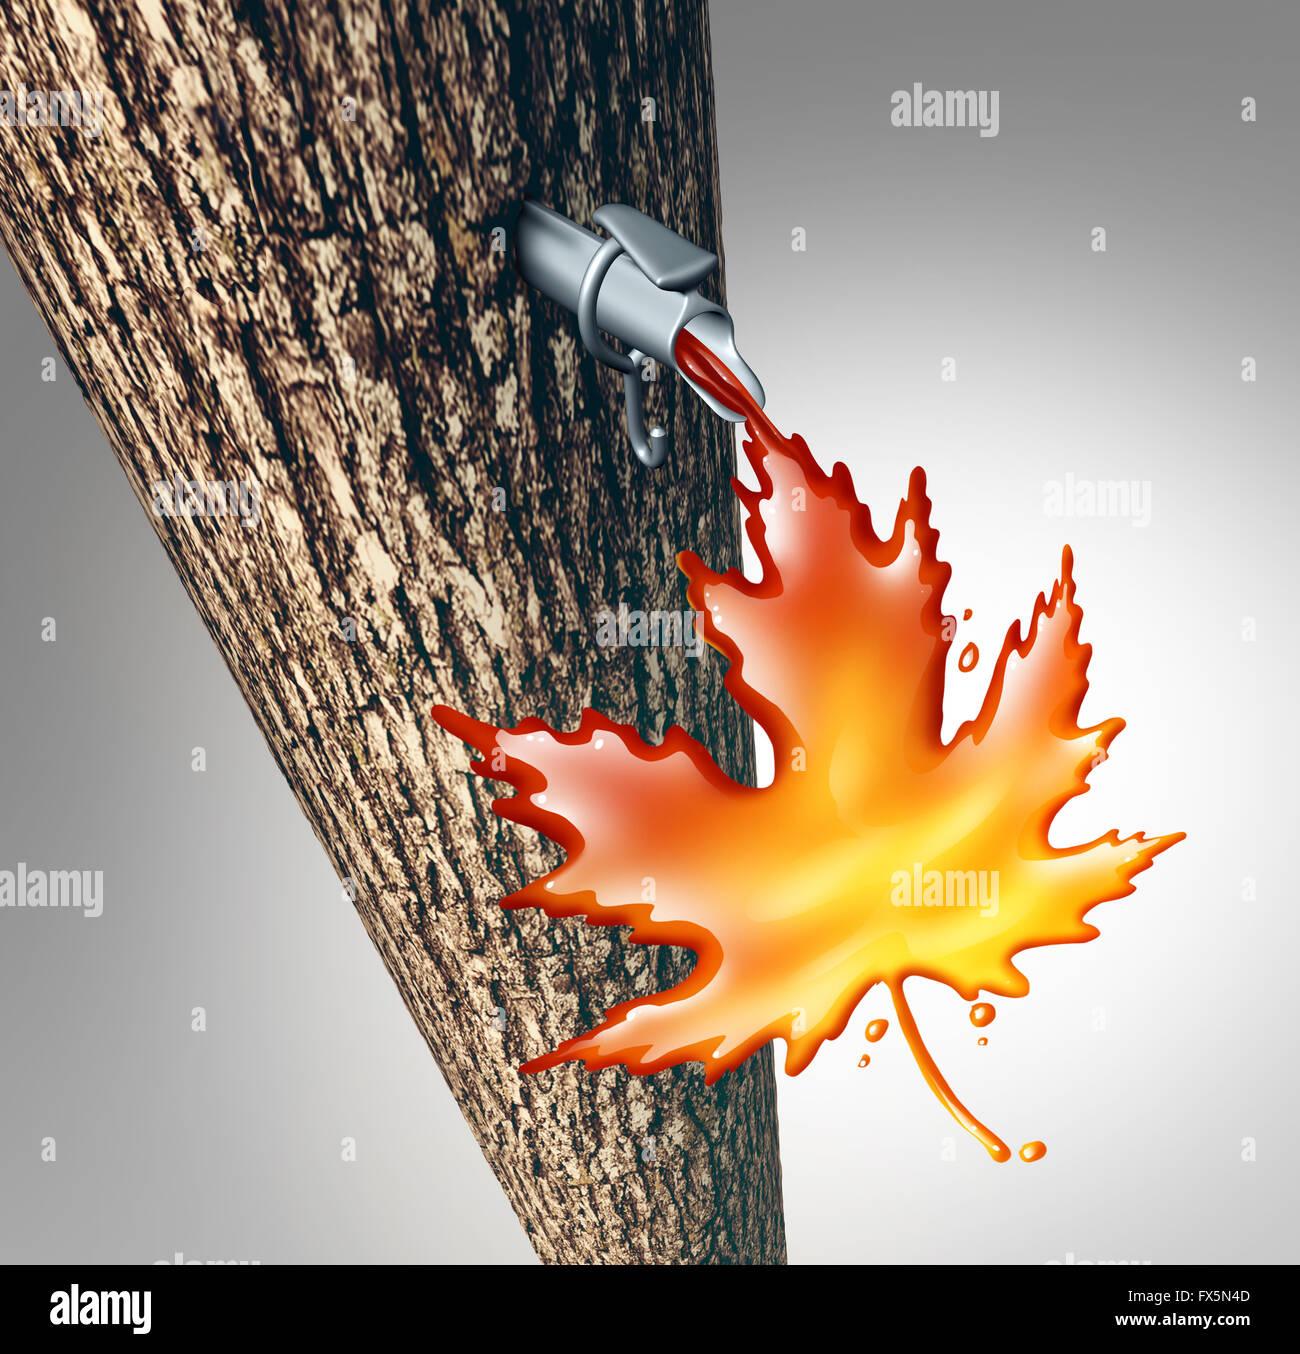 Savia de Arce concepto que fluye como un líquido dulce árbol goteo en forma de jarabe de maple leaf como Imagen De Stock